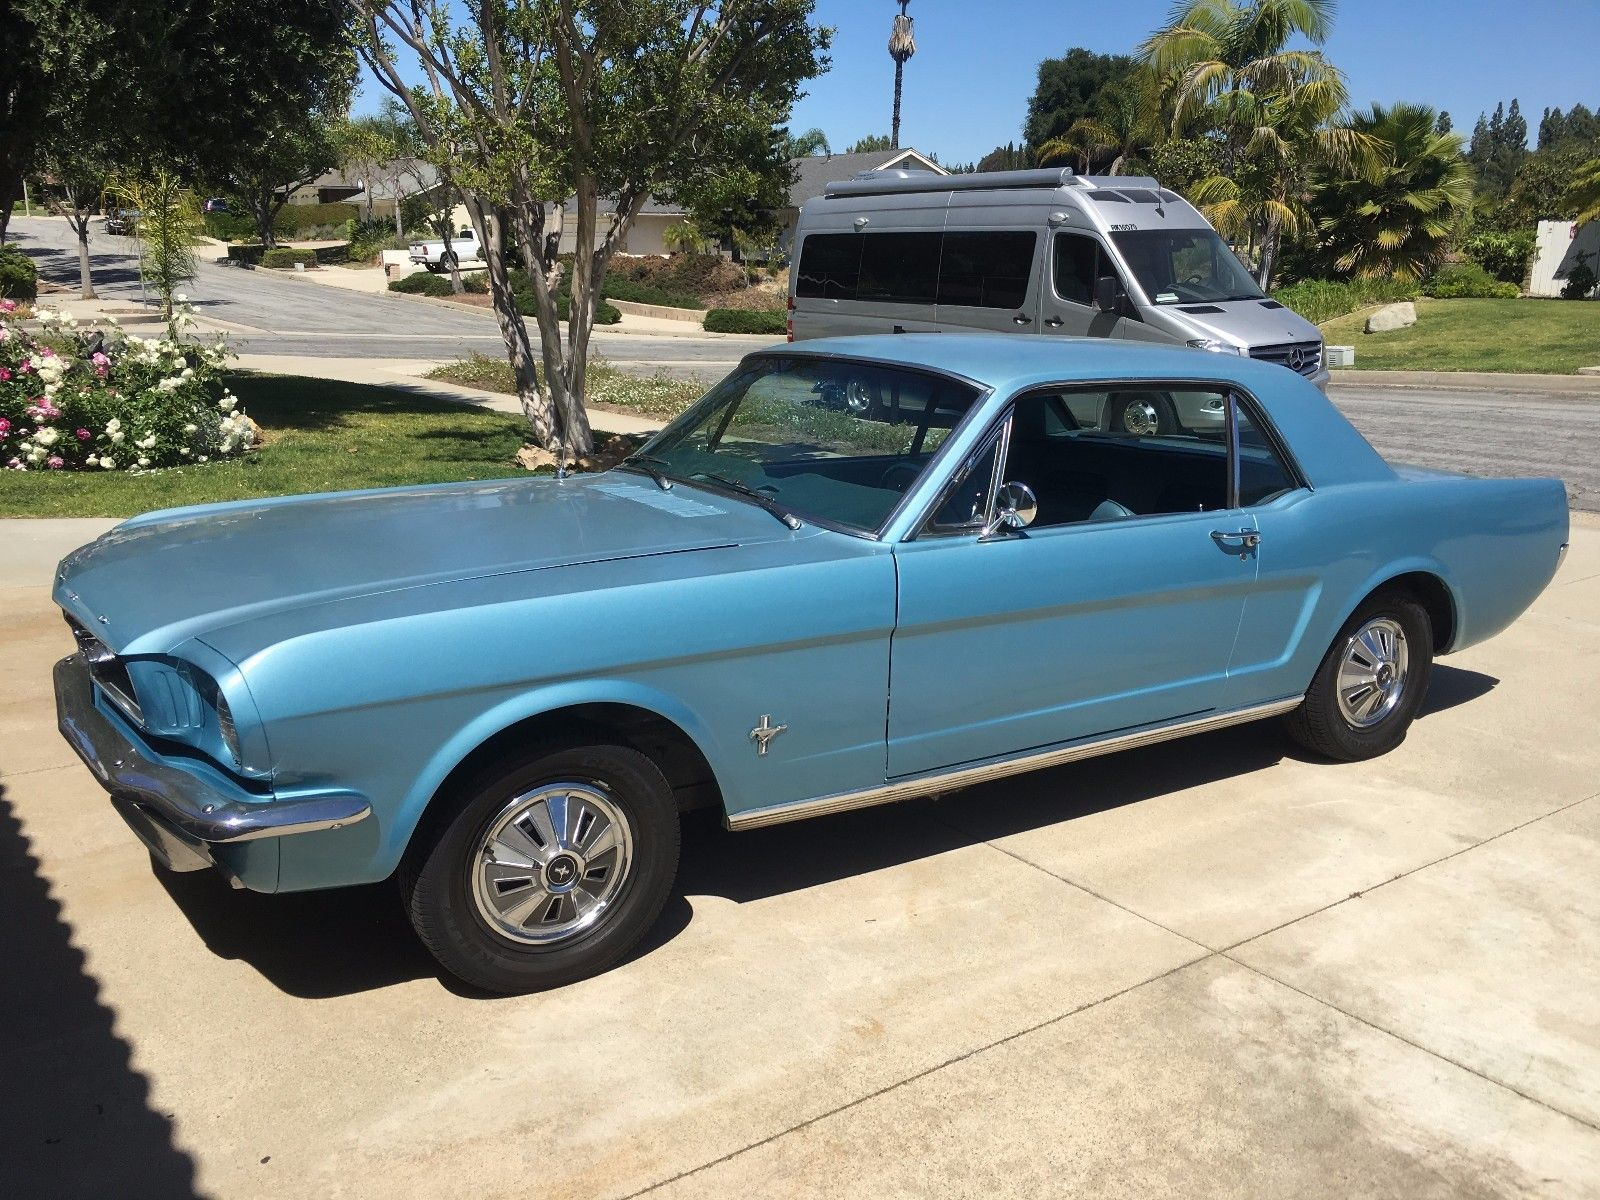 Ford mustang 1966 boss importation de voitures for Garage ford vernon 27200